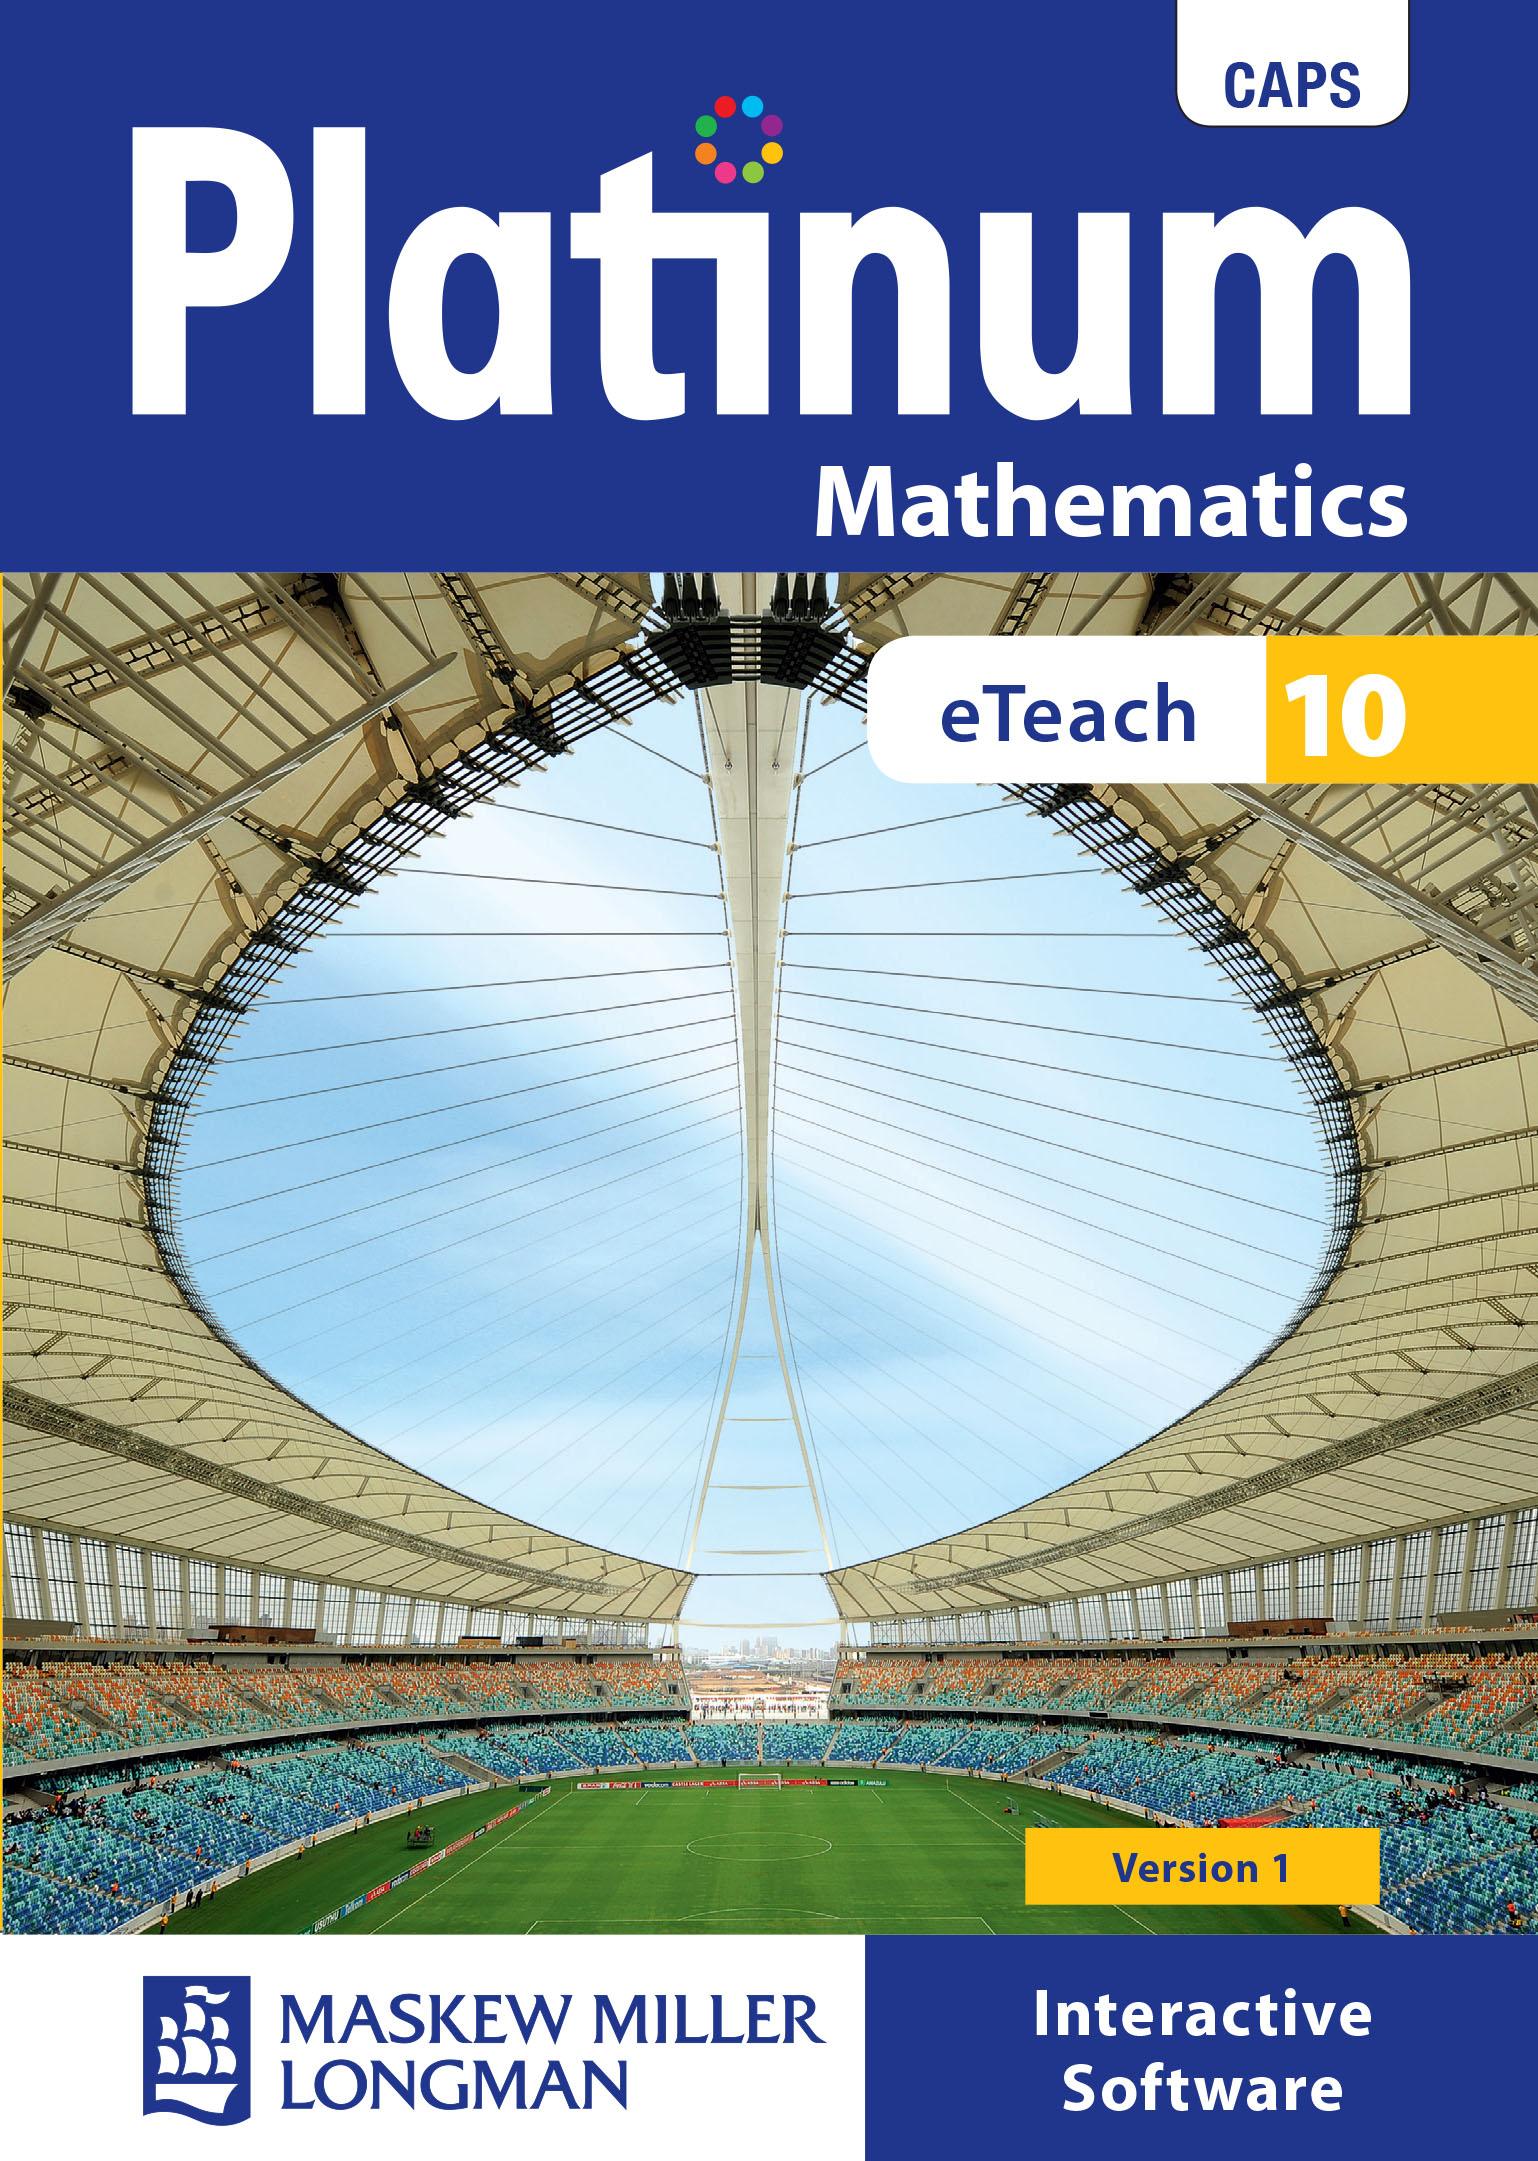 Platinum Mathematics: Grade 10: eTeach